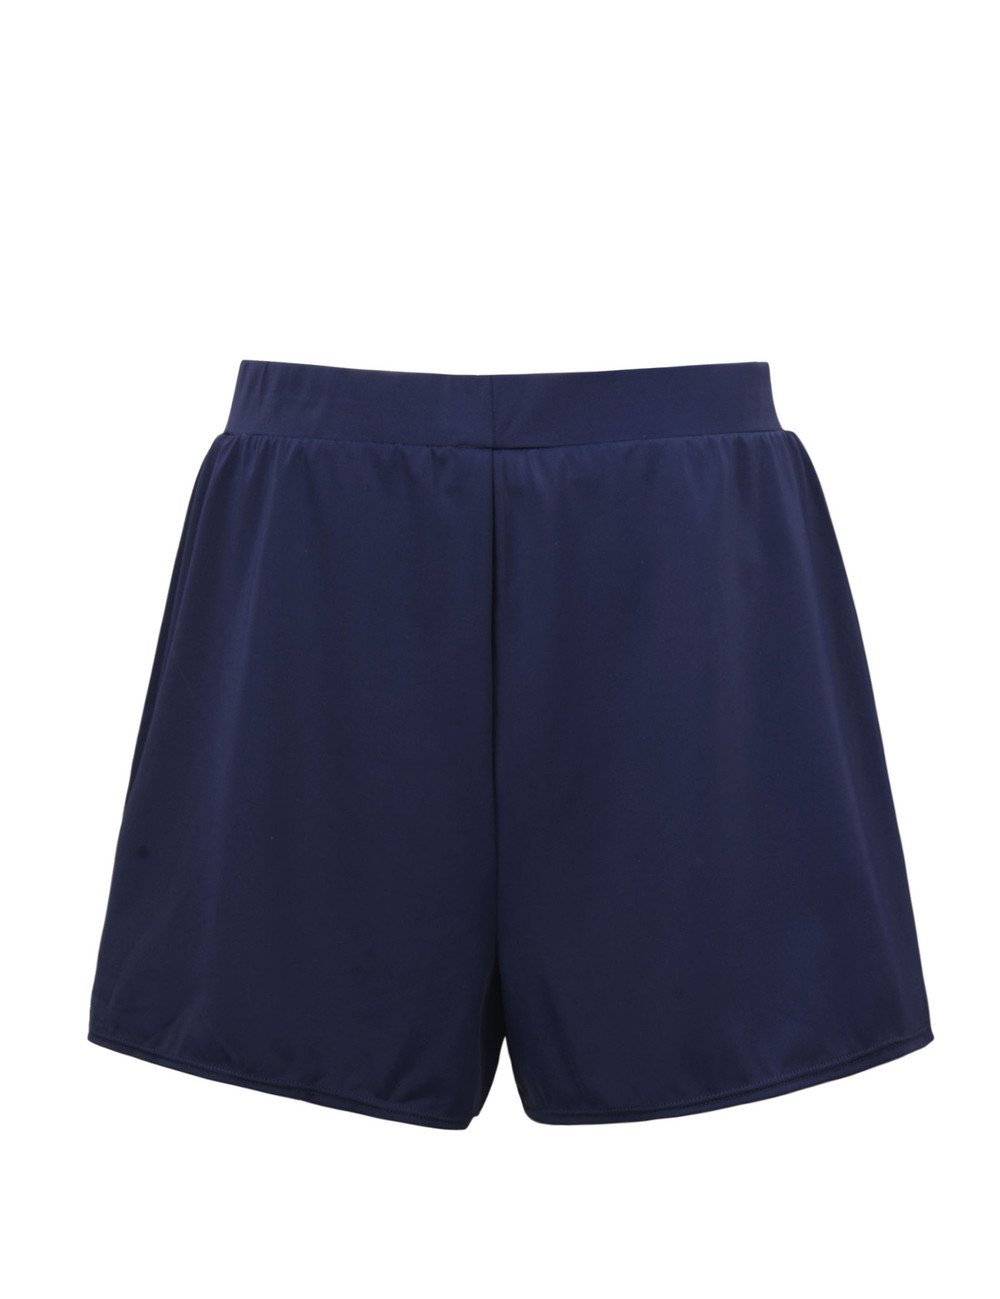 66db442ea7 Amazon.com: ninovino Women's Swim Bottoms A-Line Loose Swimsuit Boardshorts  with Briefs: Sports & Outdoors